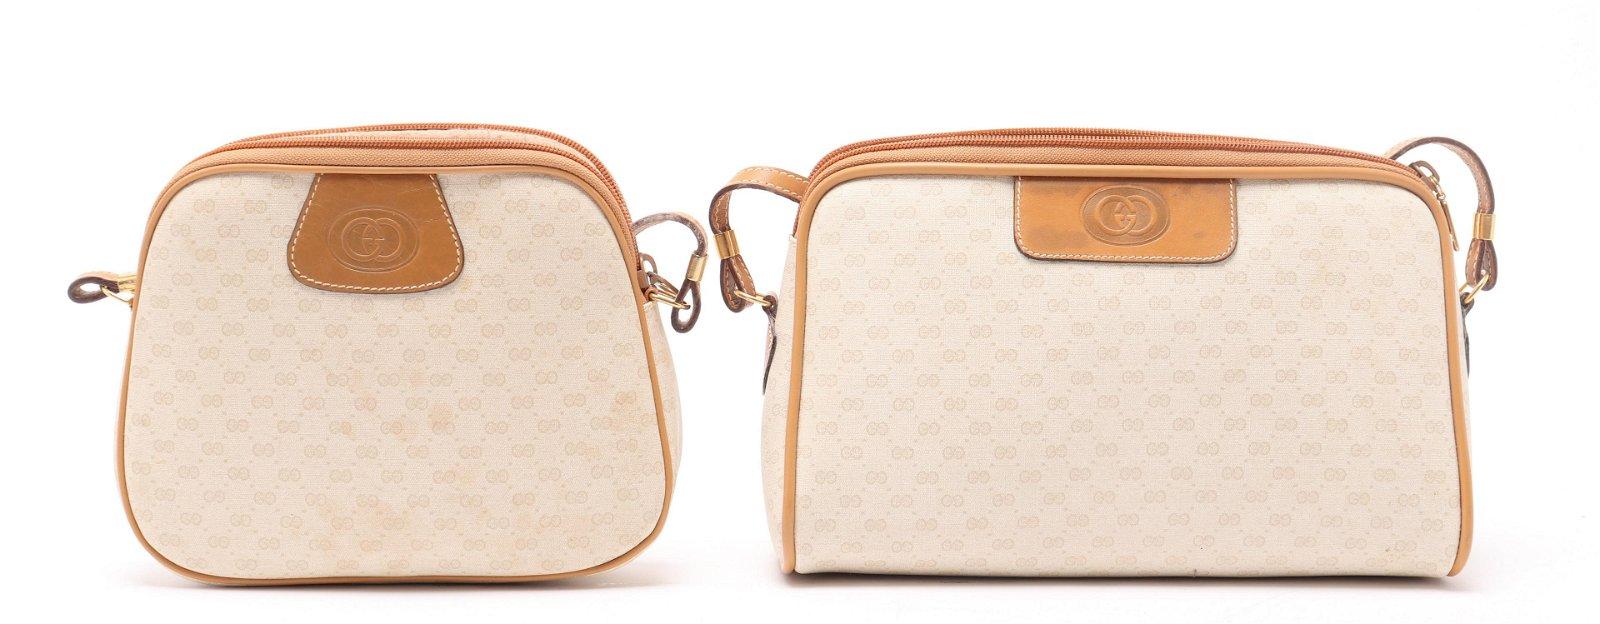 Gucci Monogram Canvas & Leather Handbags, 2